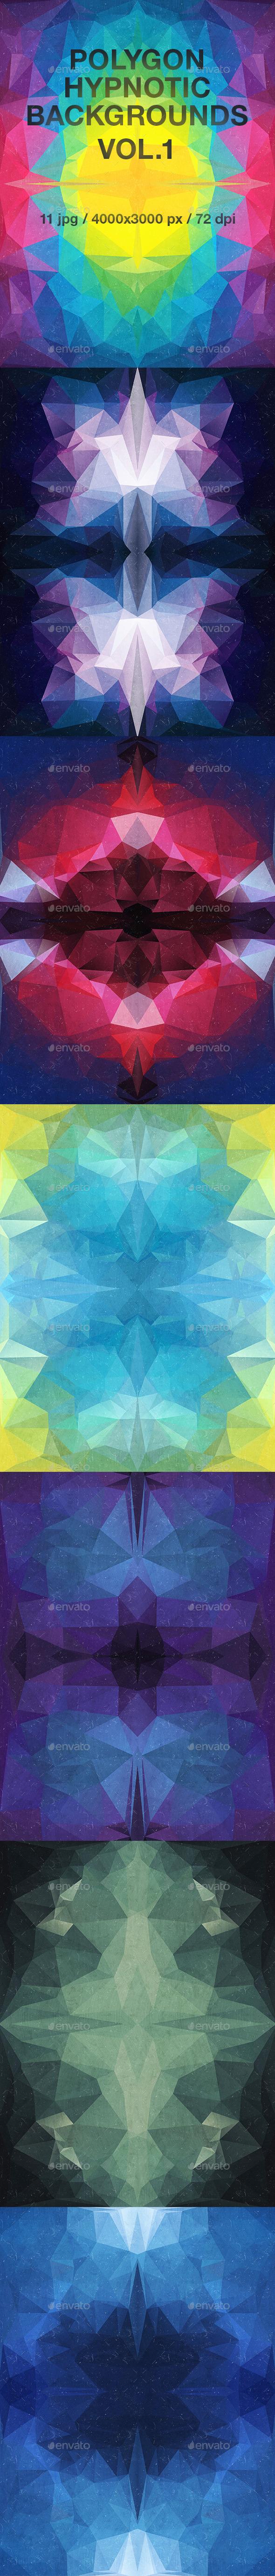 Polygon Hypnotic Backgrounds Vol.1